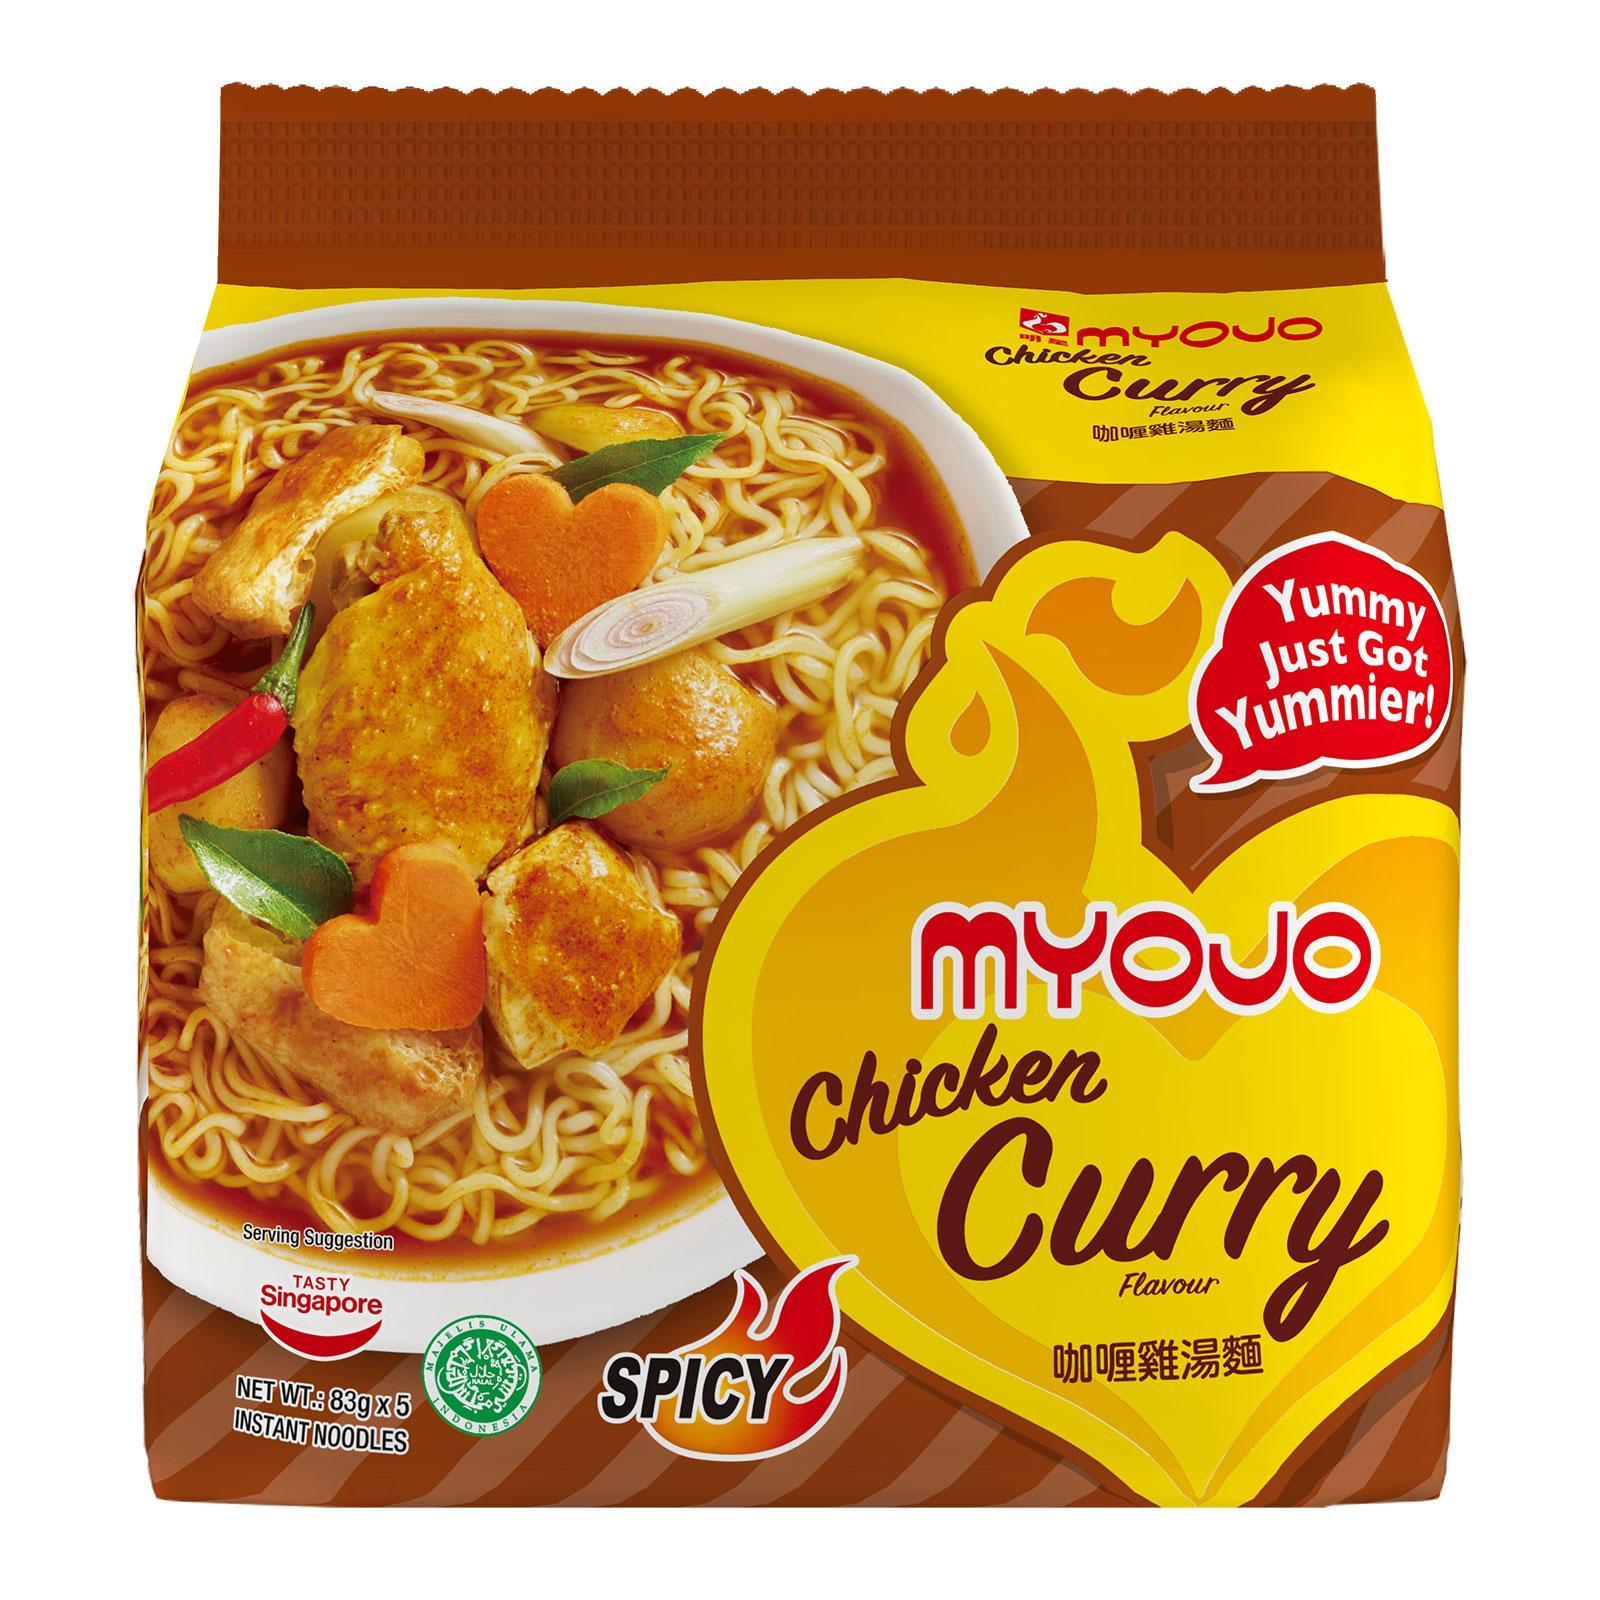 Myojo Instant Noodles - Curry Chicken